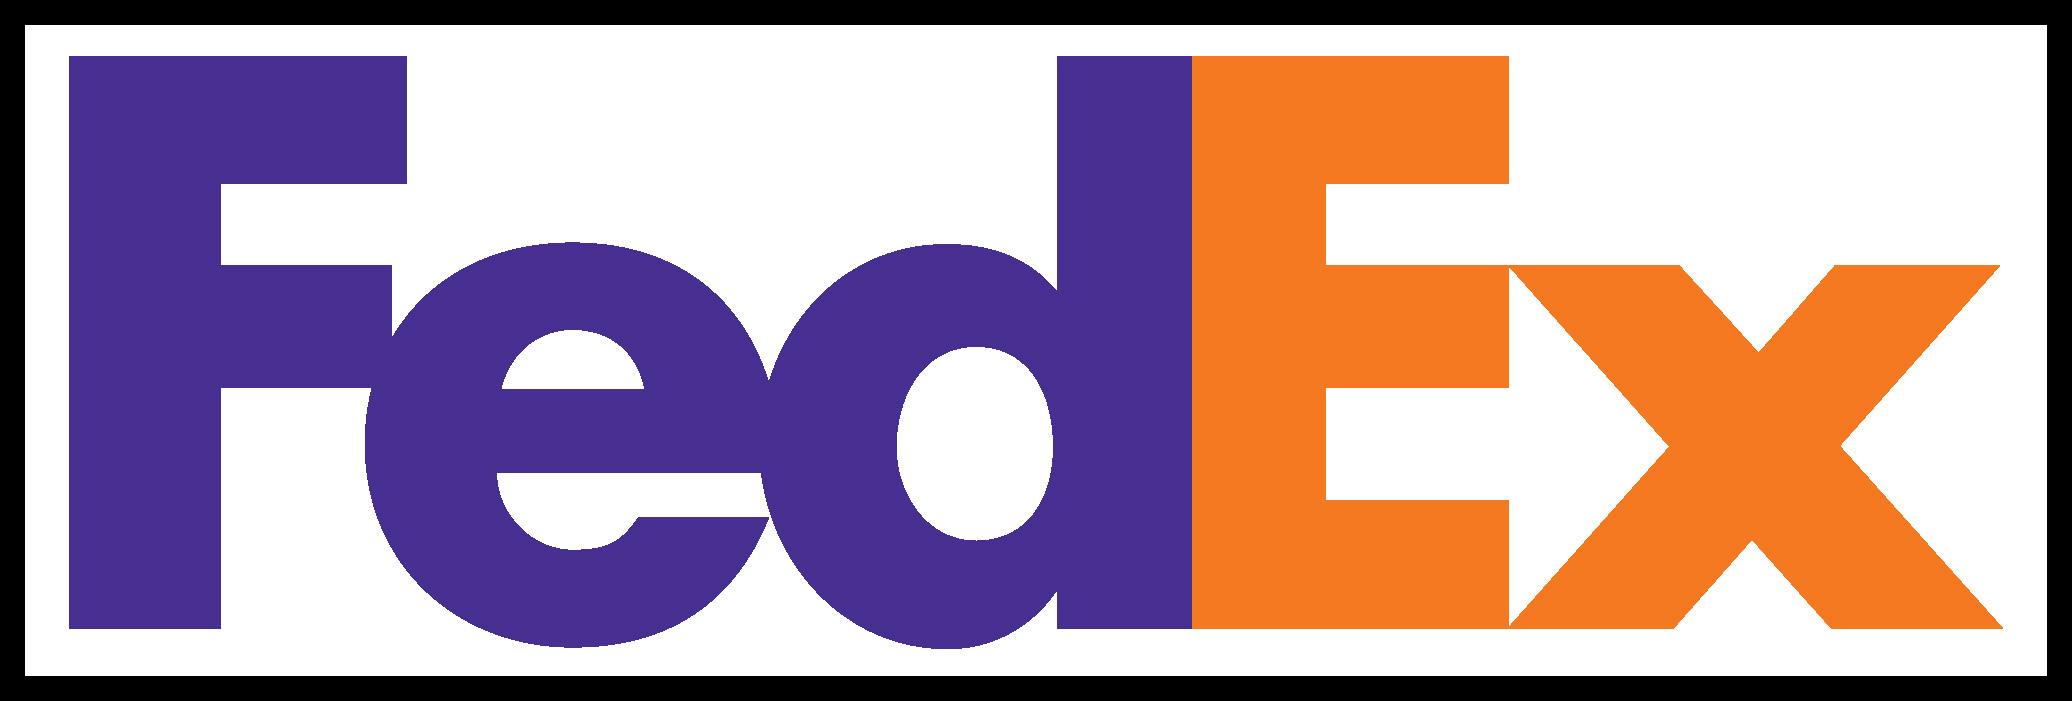 Fedex logo clipart.